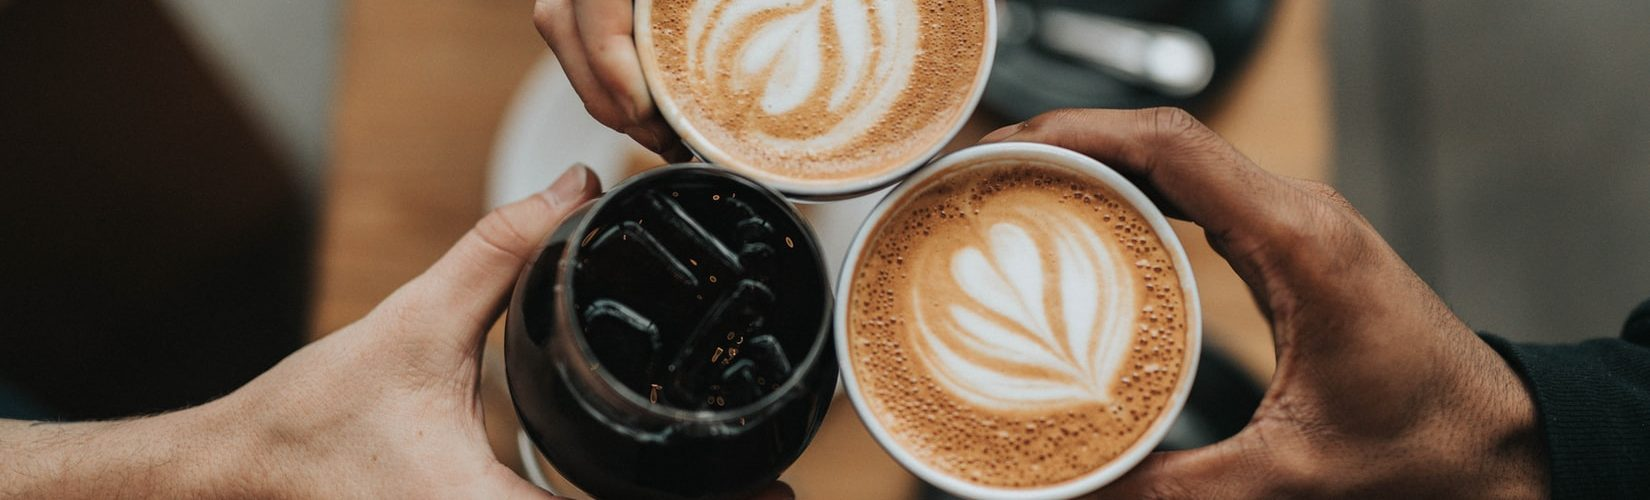 koffie-proosten